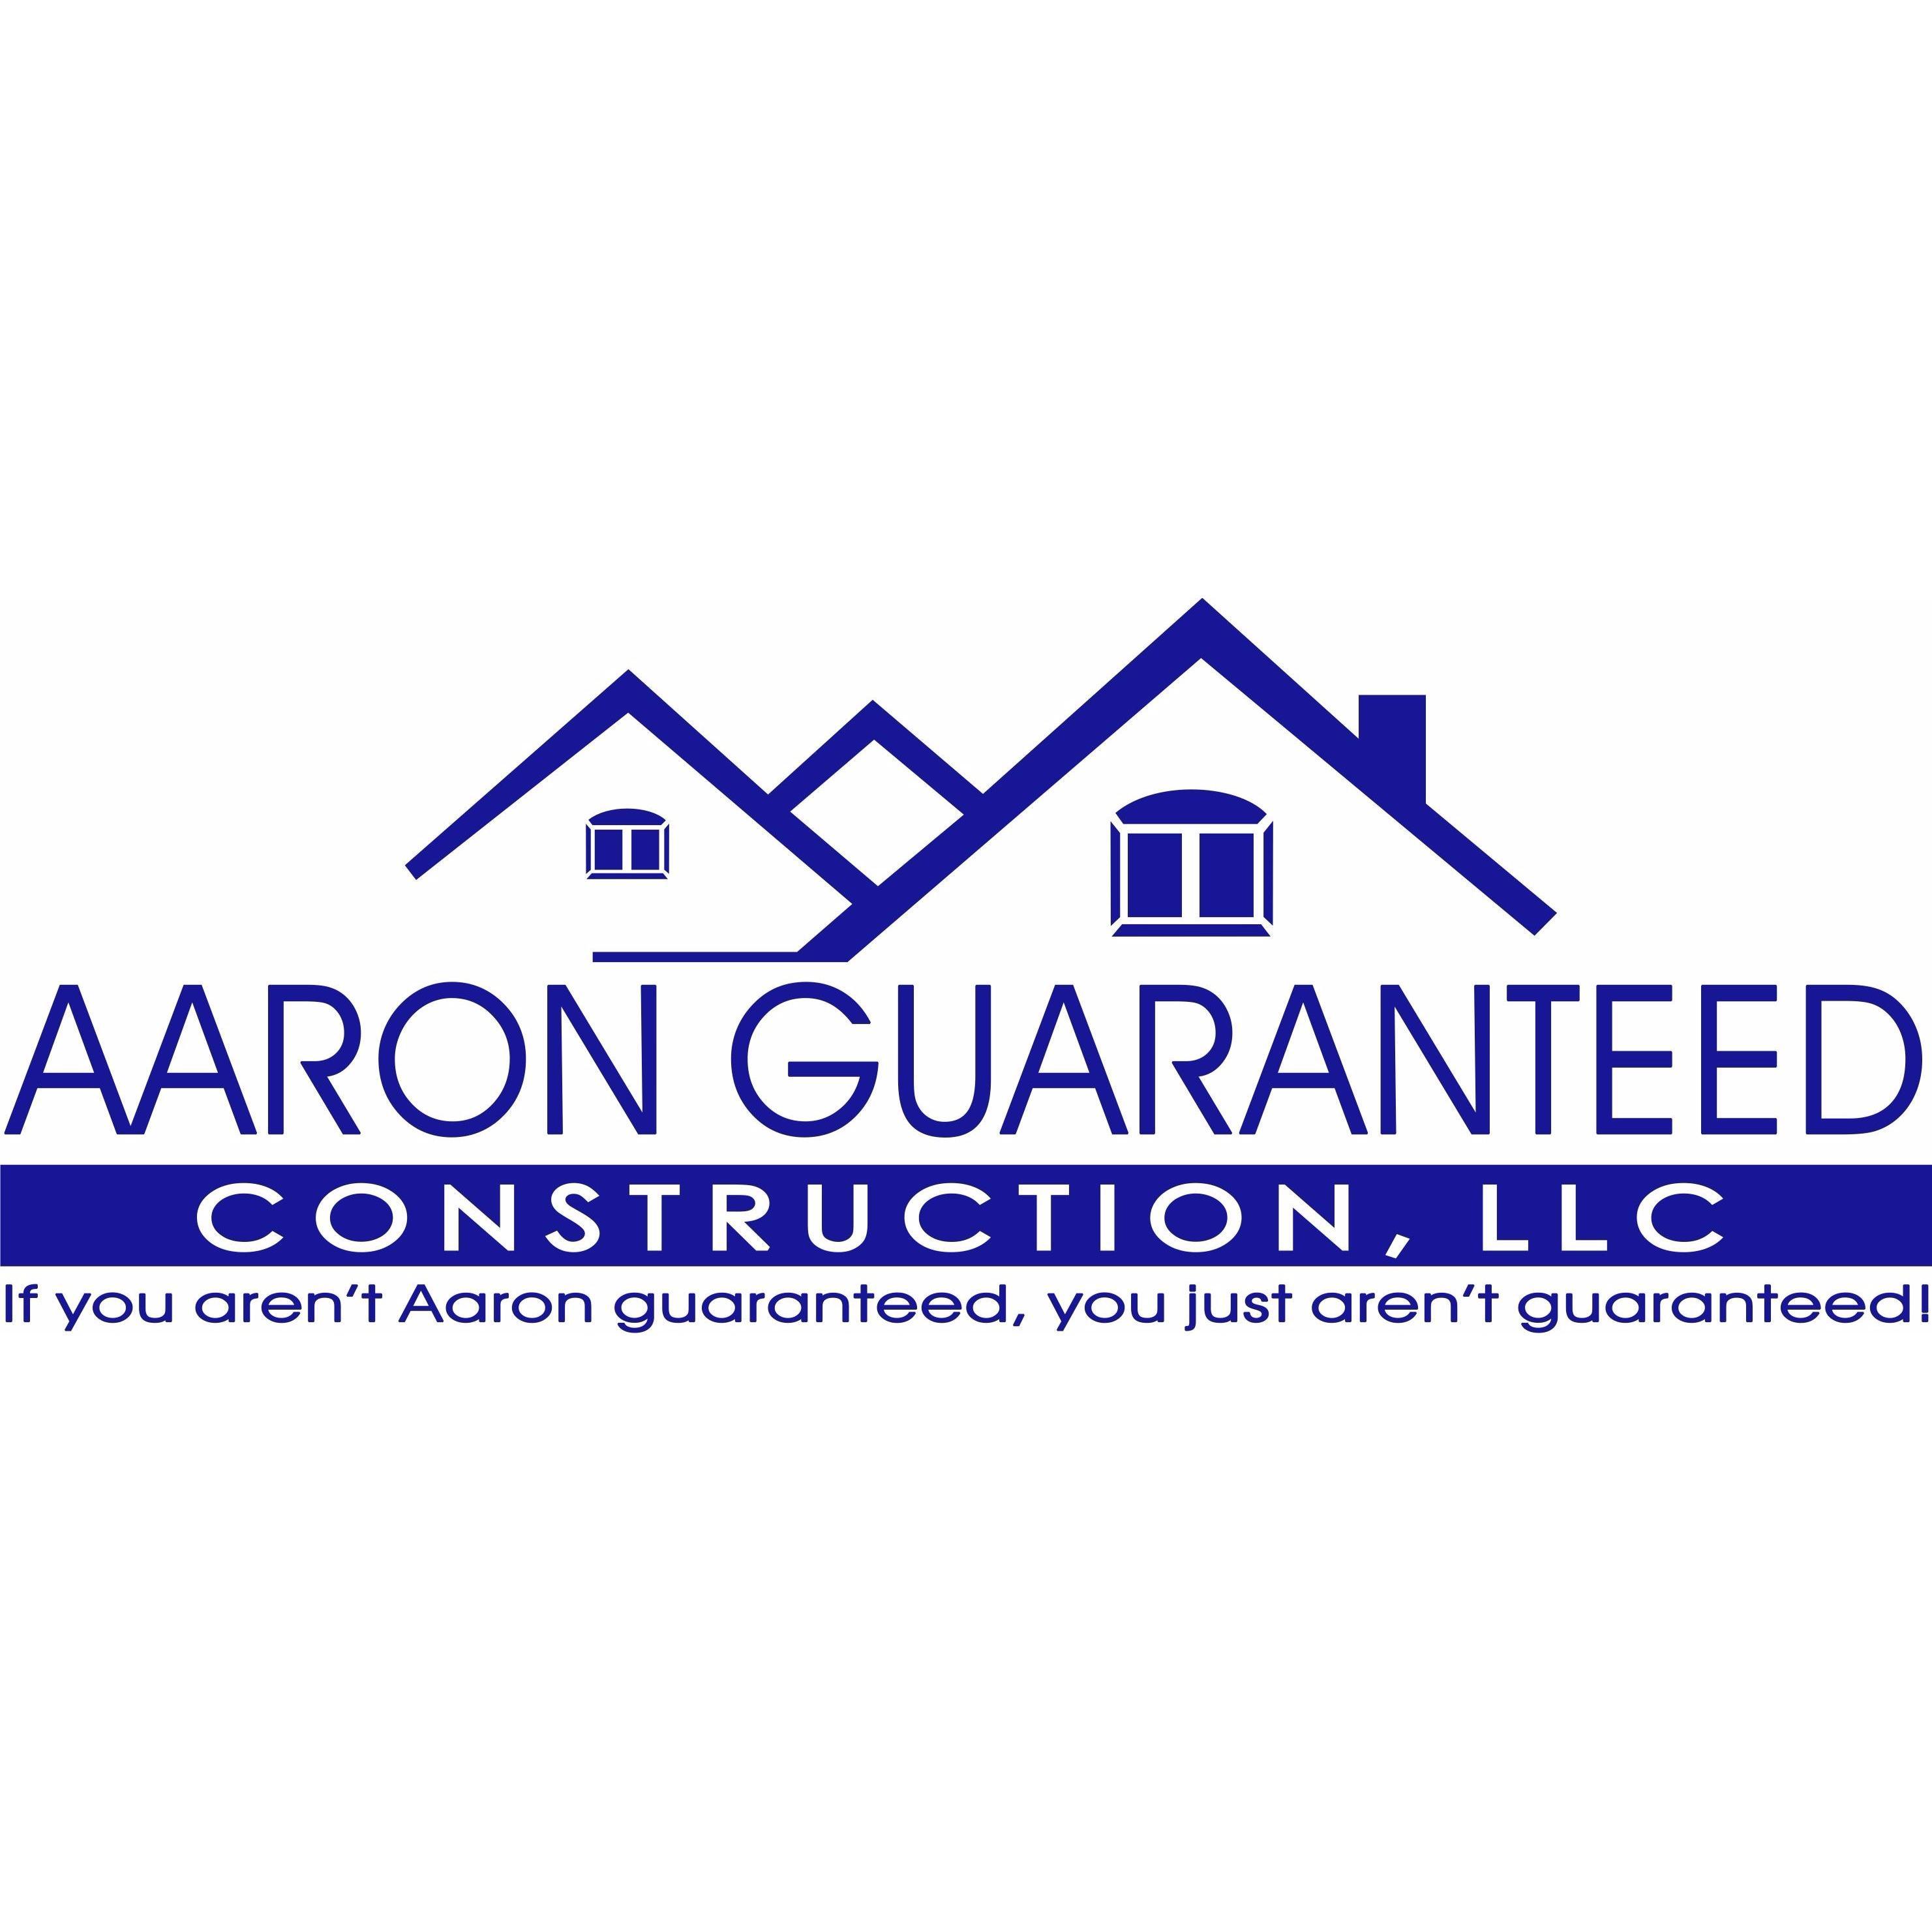 Aaron Guaranteed Construction Llc West Columbia Sc